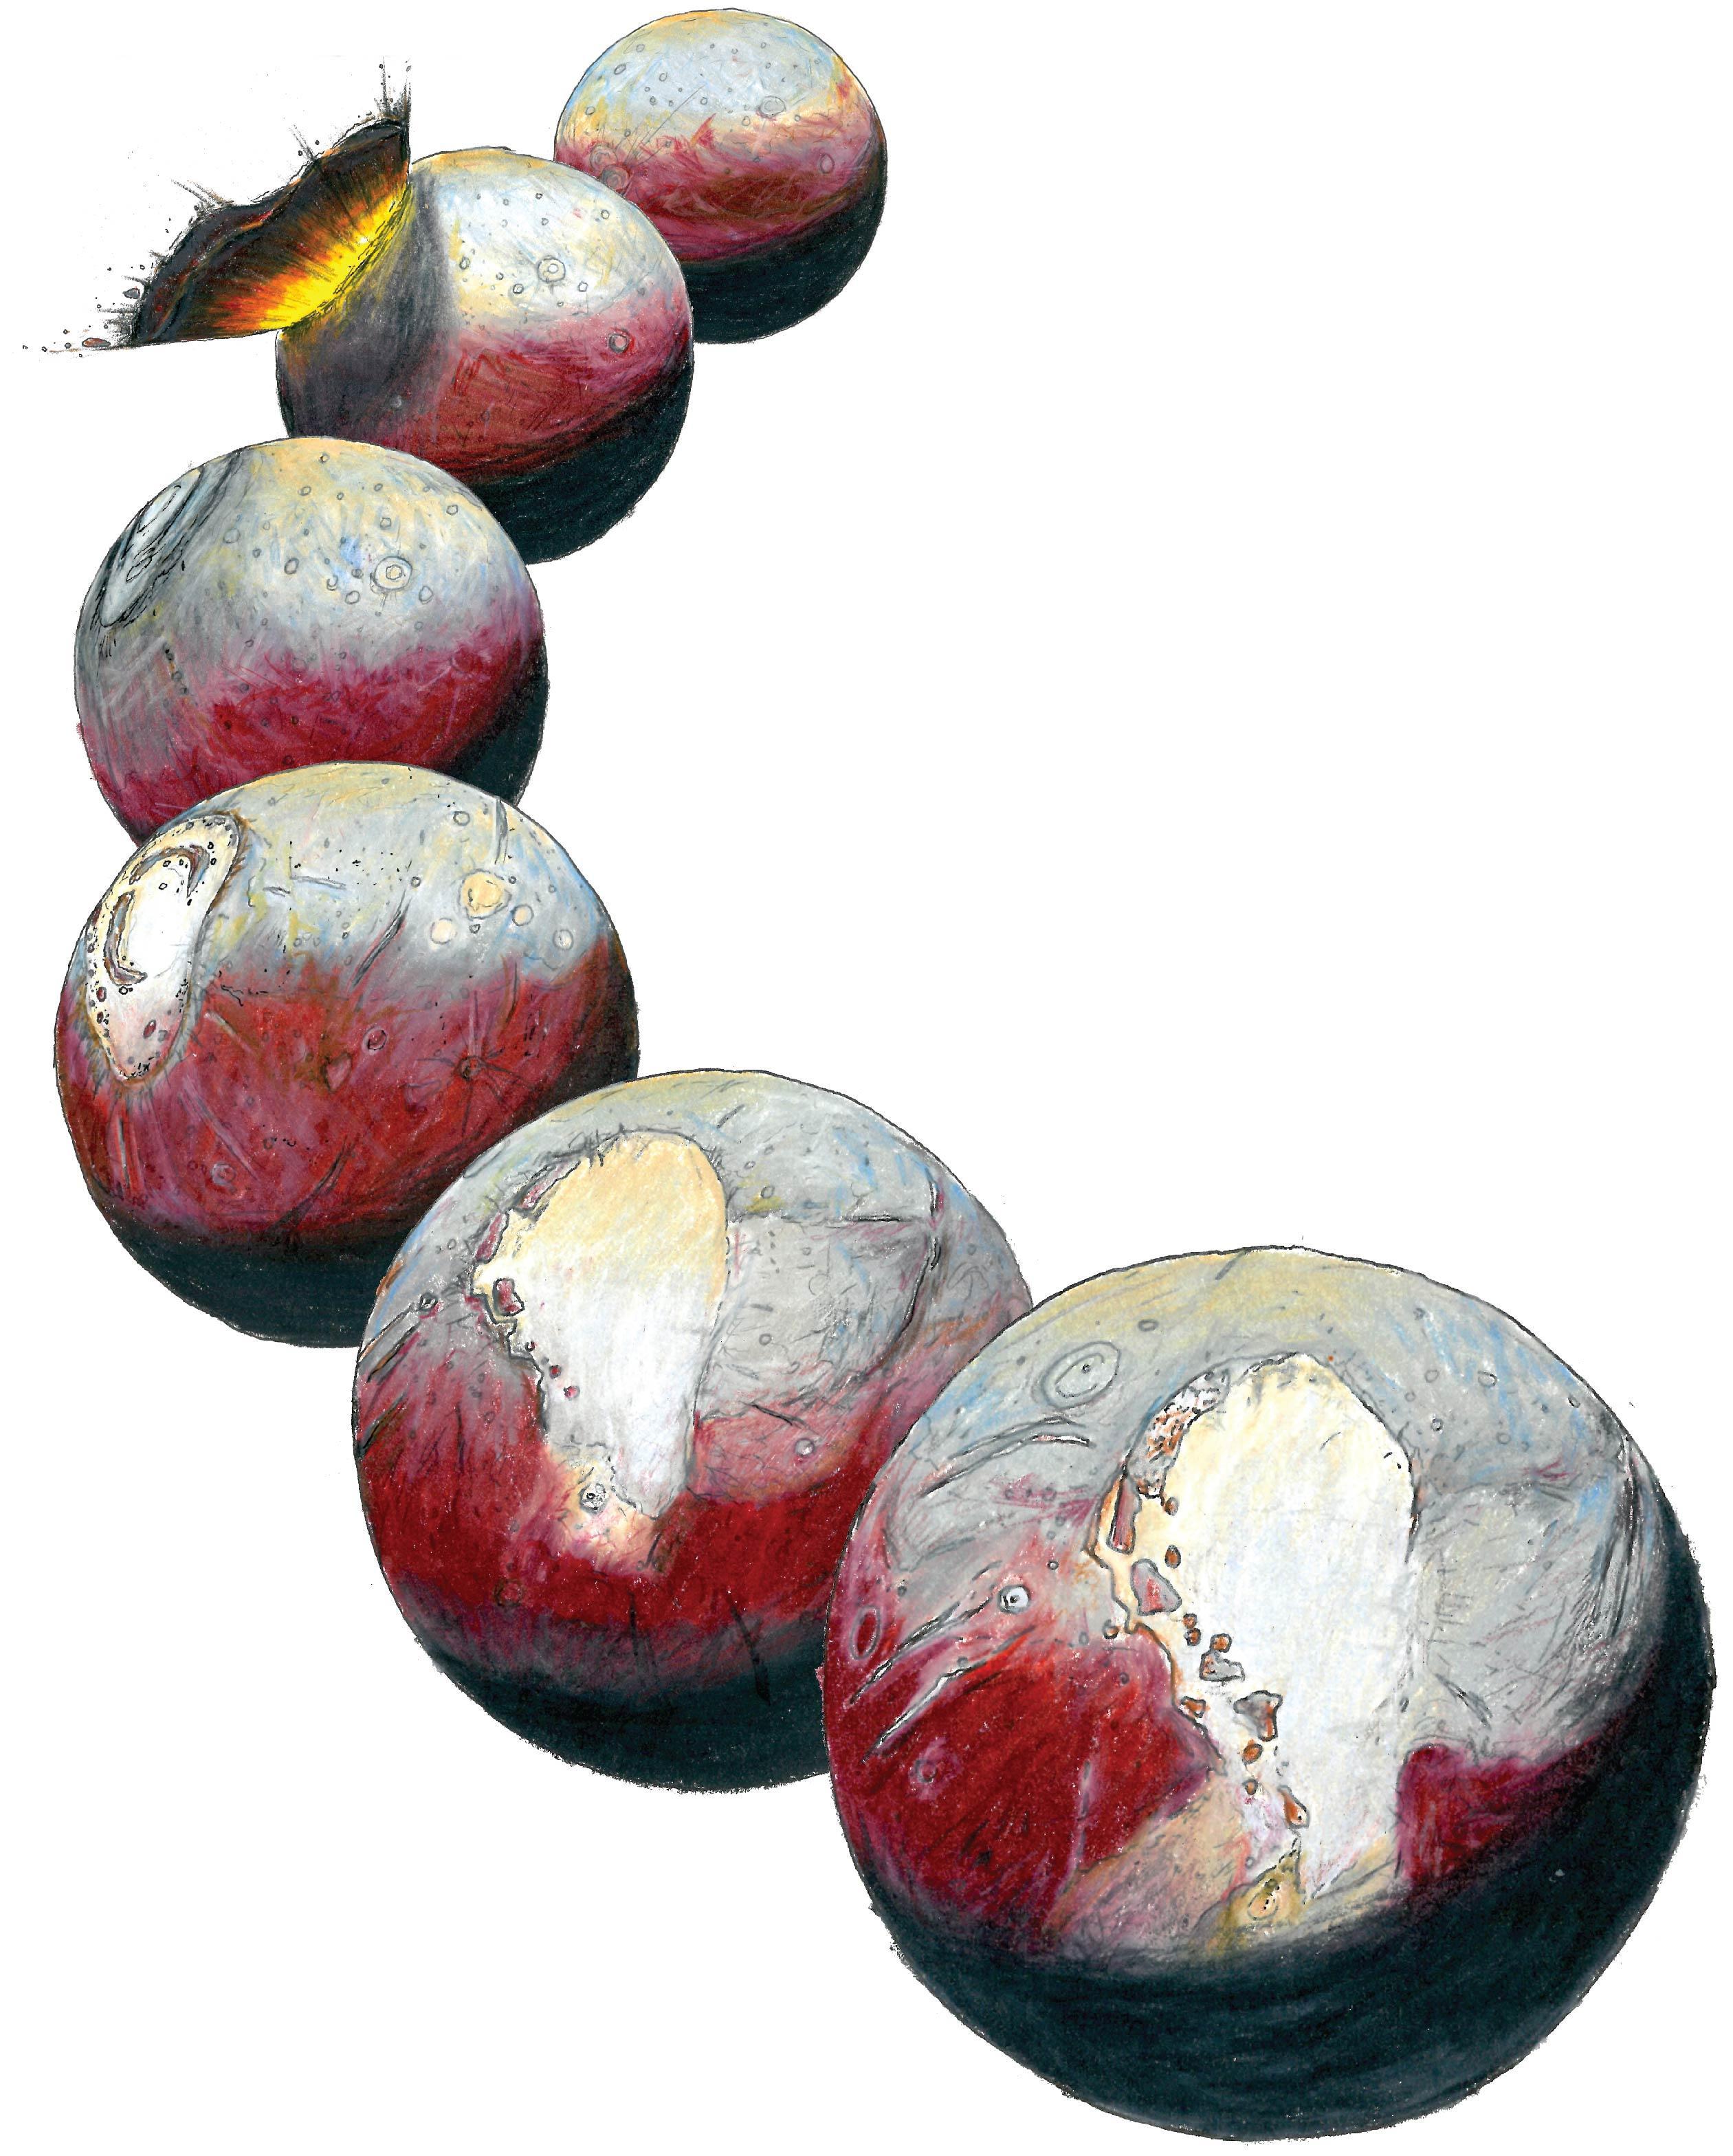 Reorienting Pluto